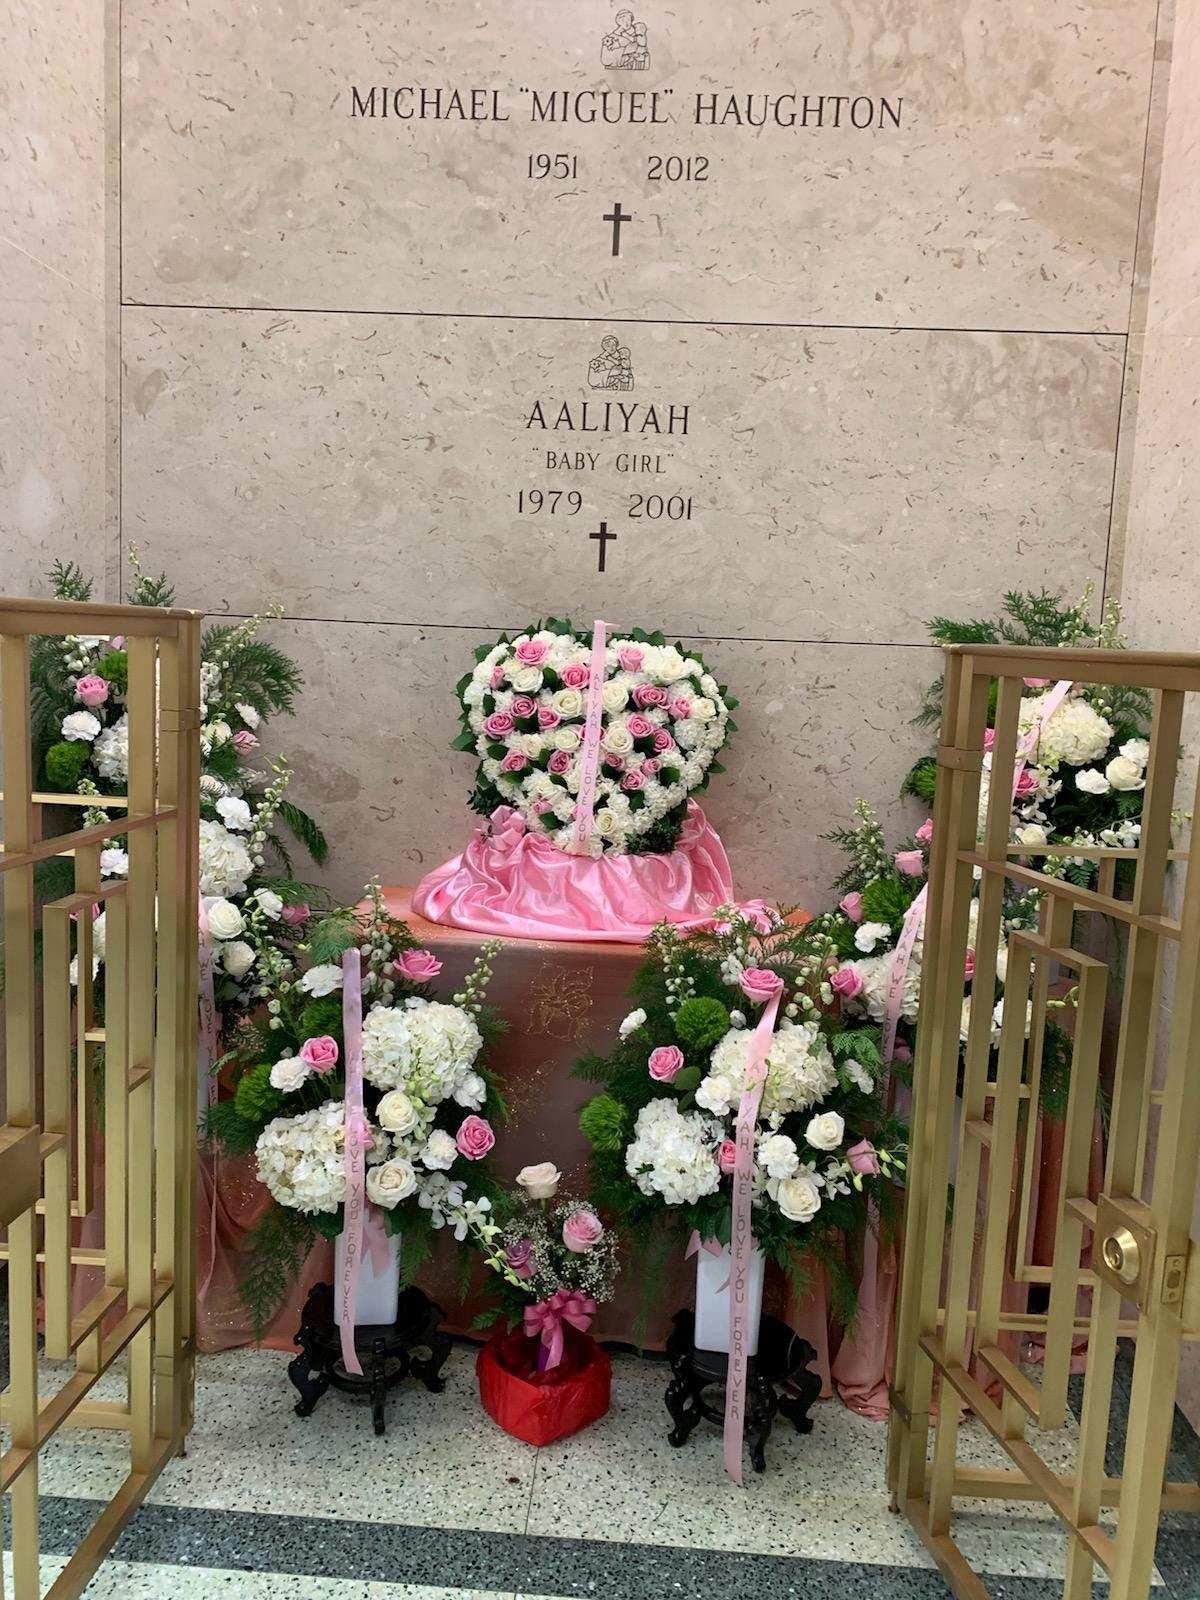 Happy Birthday Aaliyah, We Love You Forever!